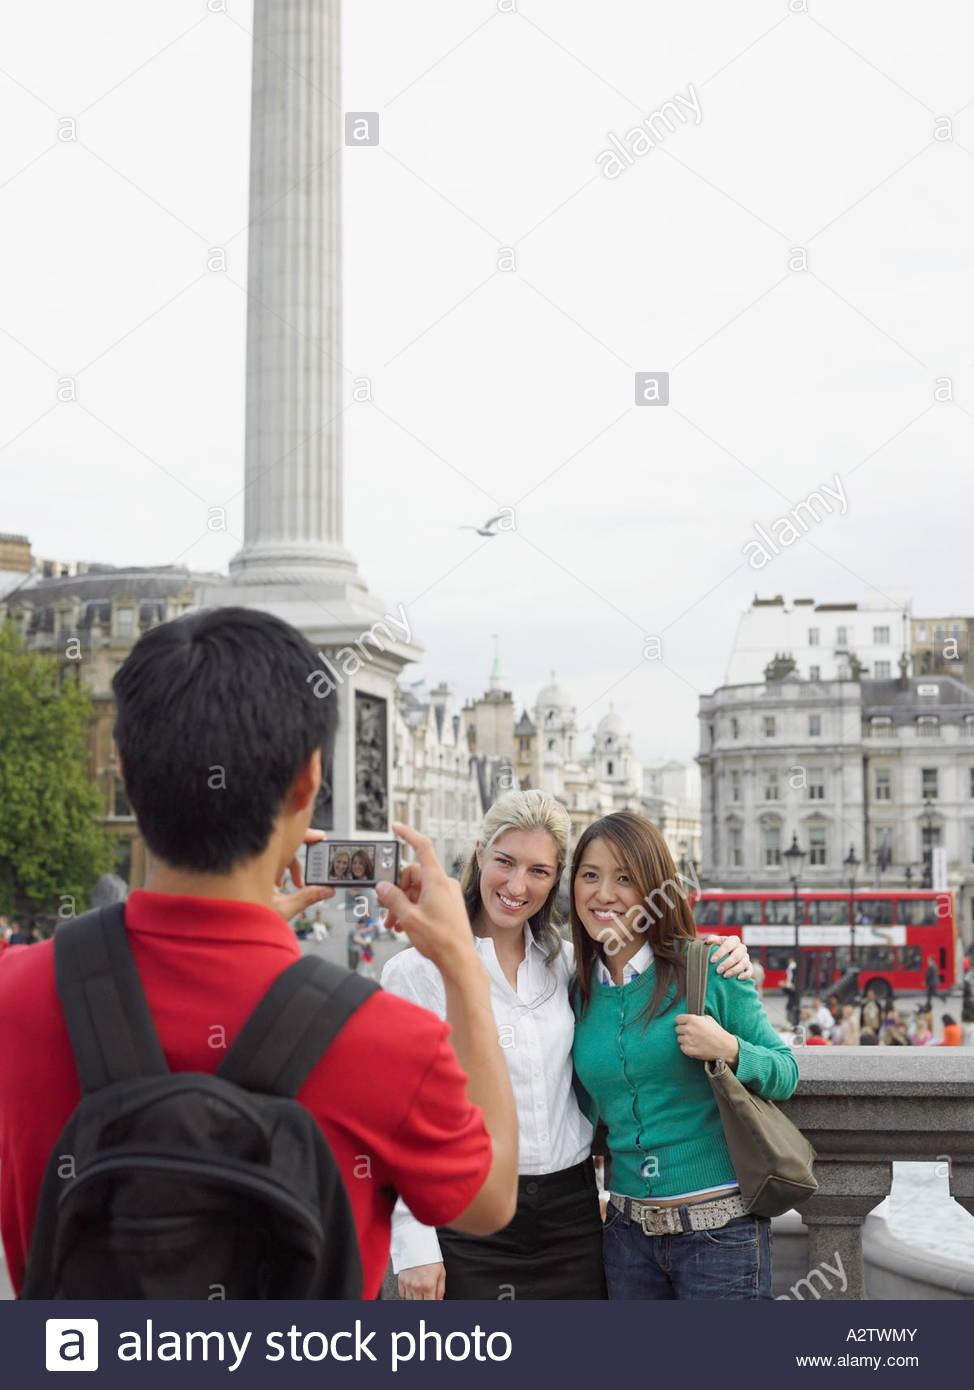 Tourists having photo taken - Stock Image